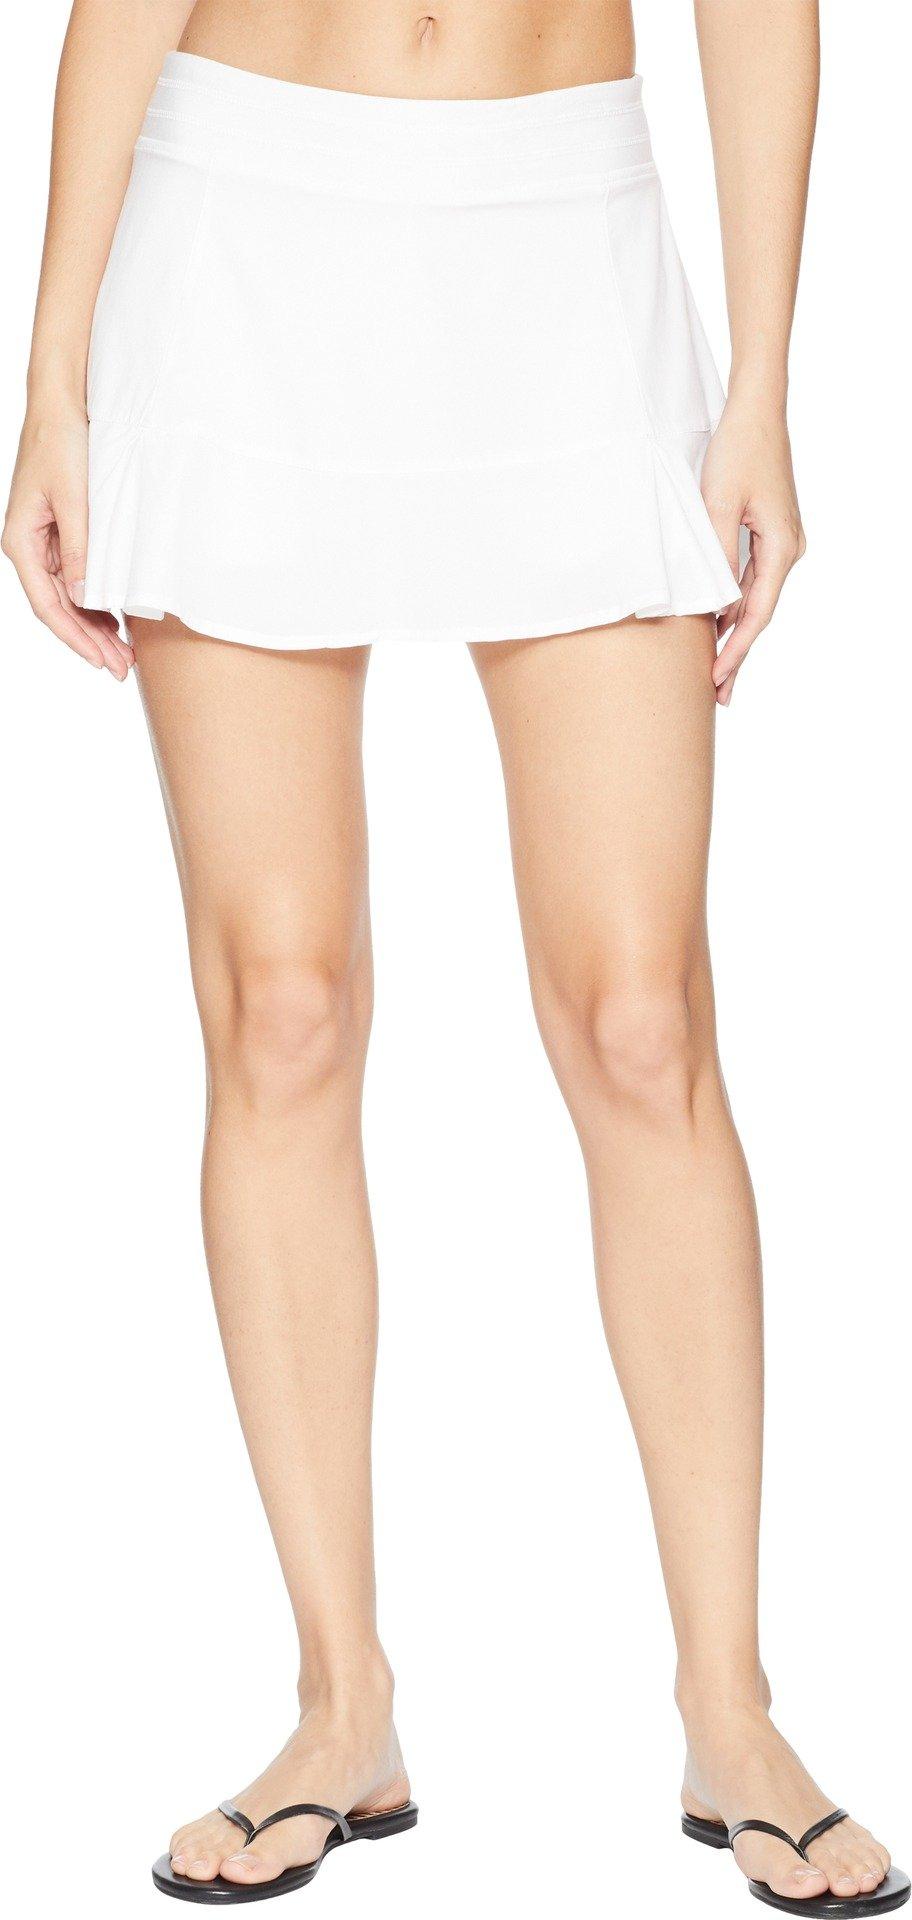 tasc Performance Rhythm Skirt, White, Medium by tasc Performance